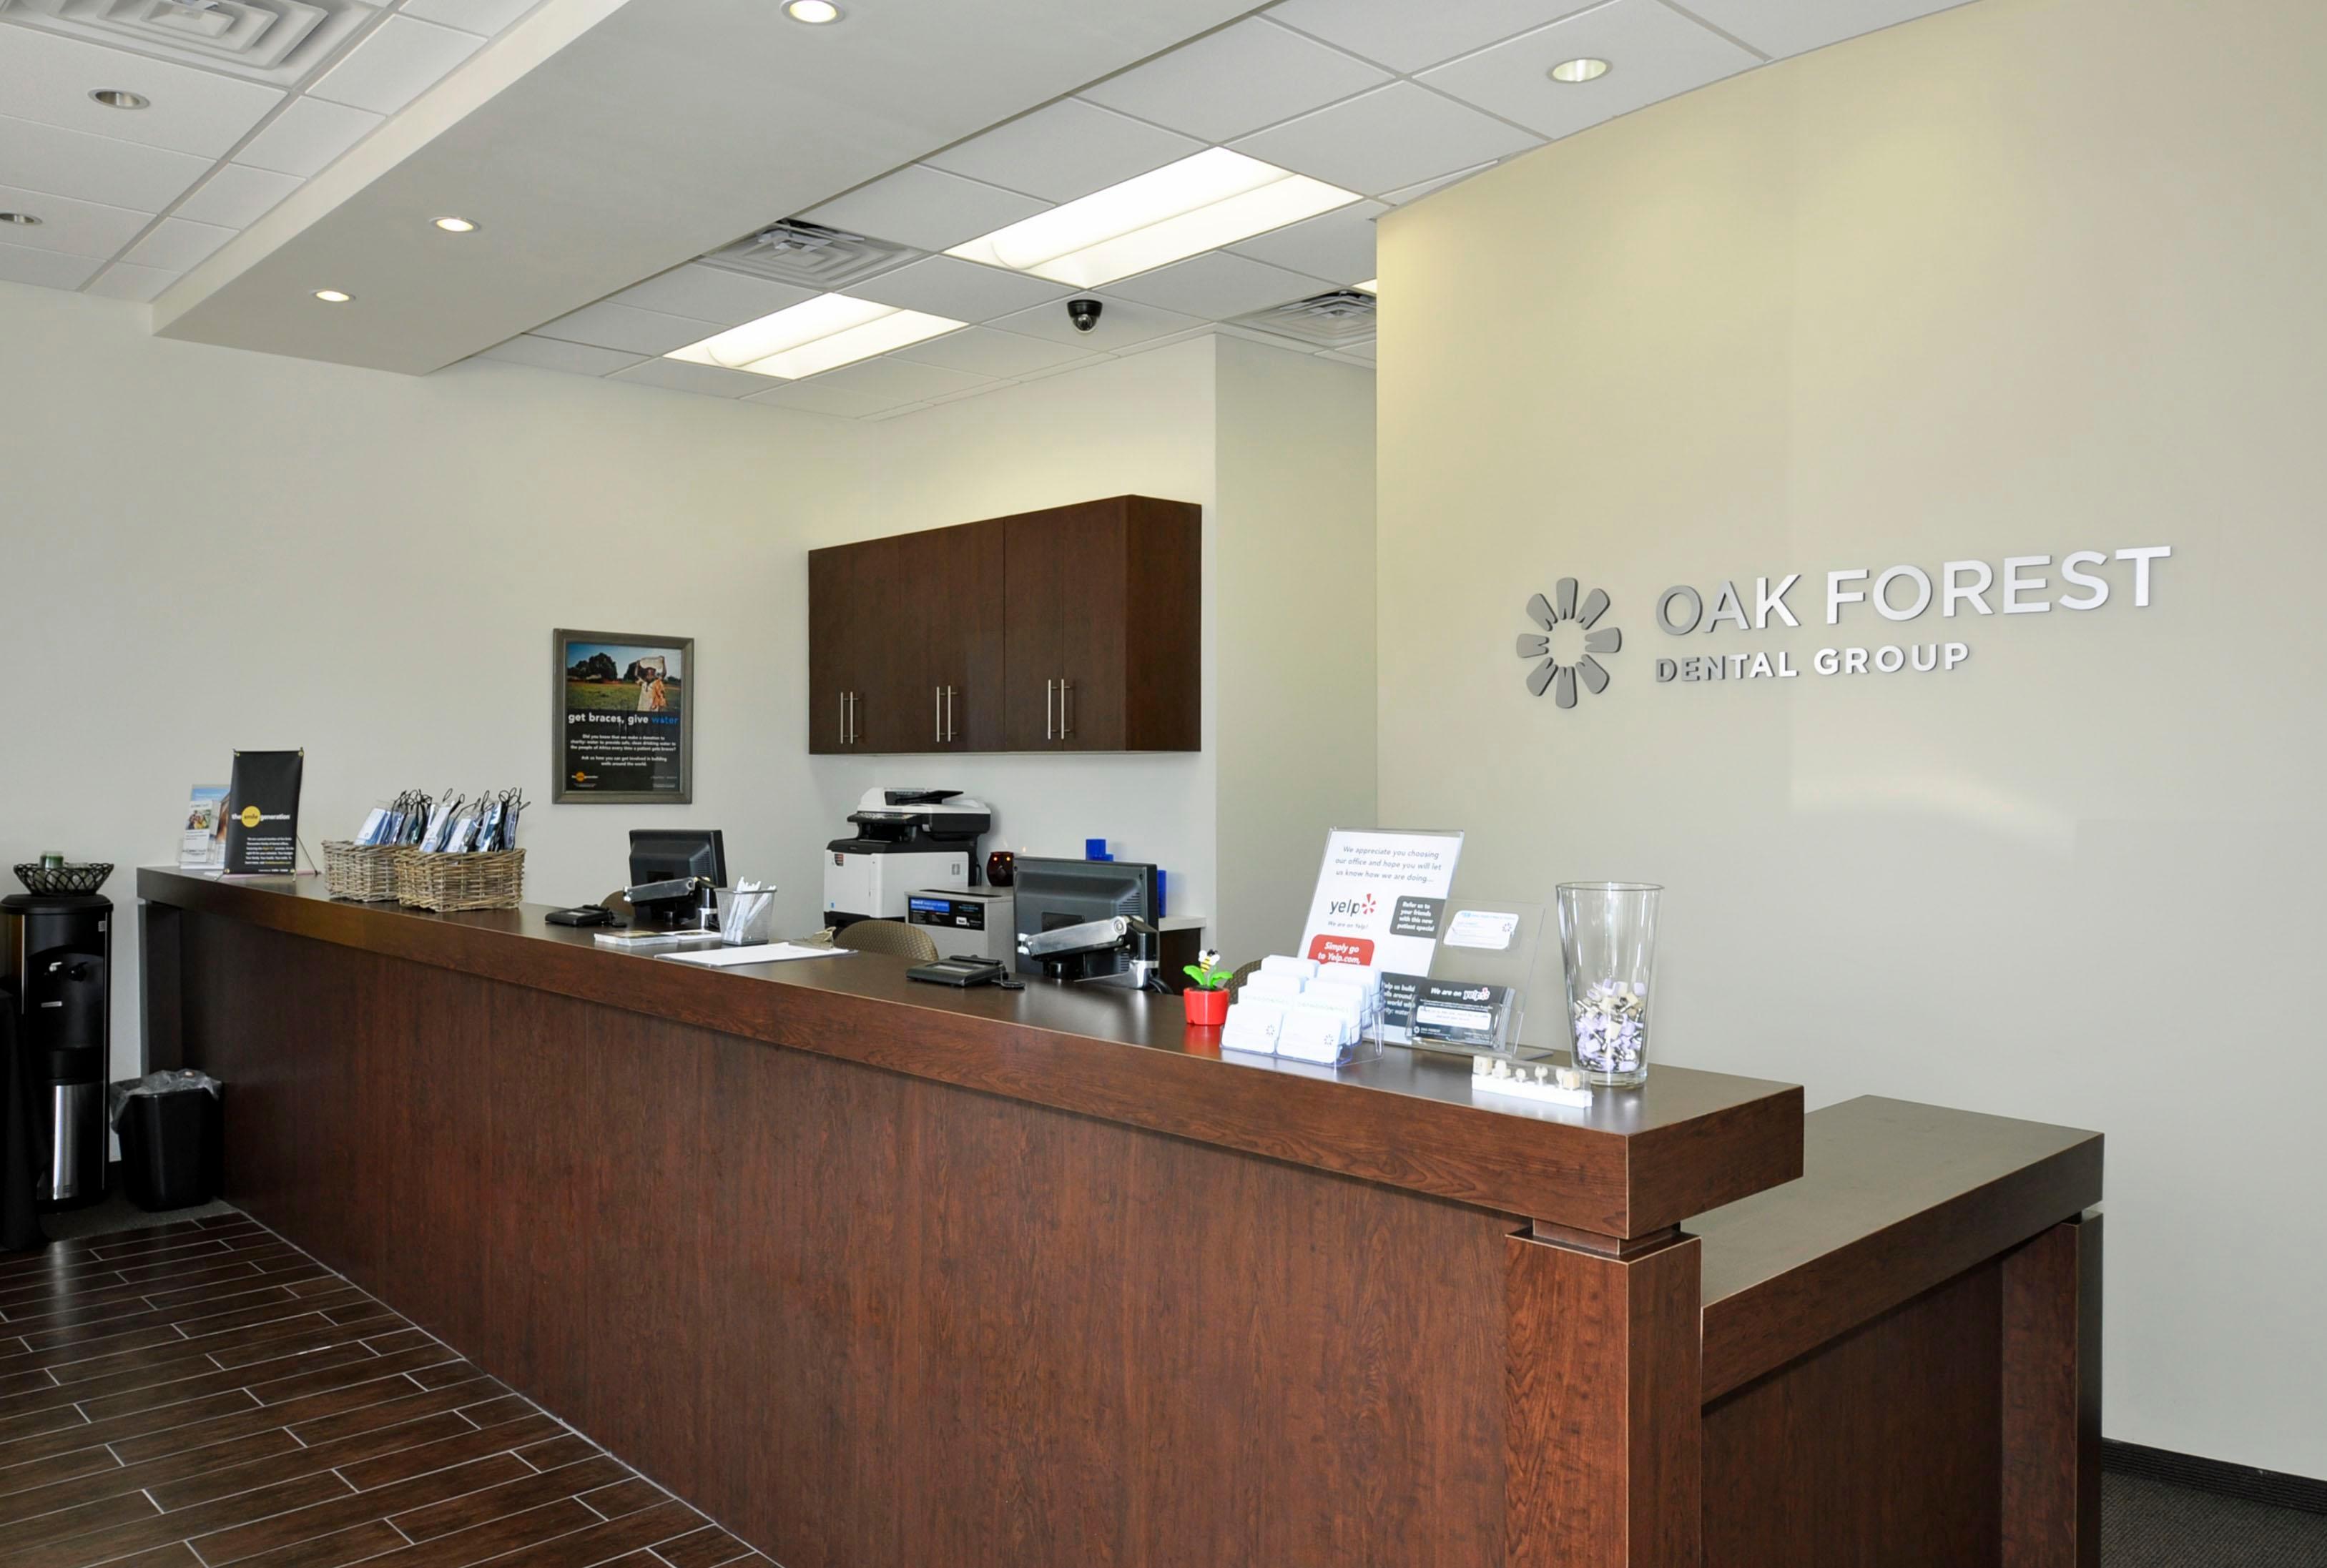 Oak Forest Dental Group and Orthodontics image 7